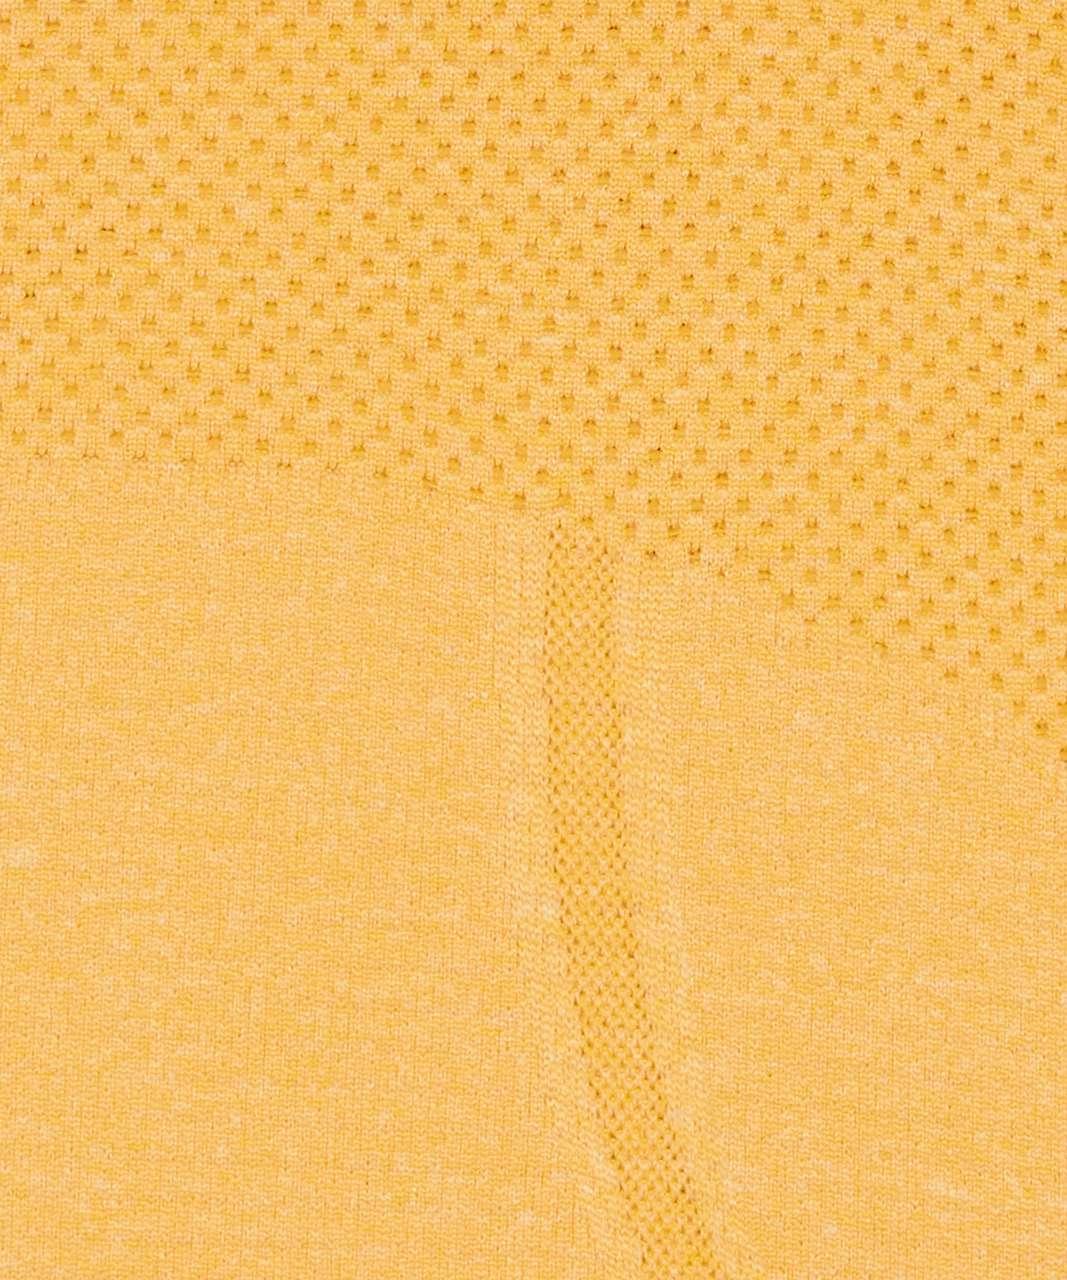 Lululemon Swiftly Tech Long Sleeve Crew - Honey Lemon / White